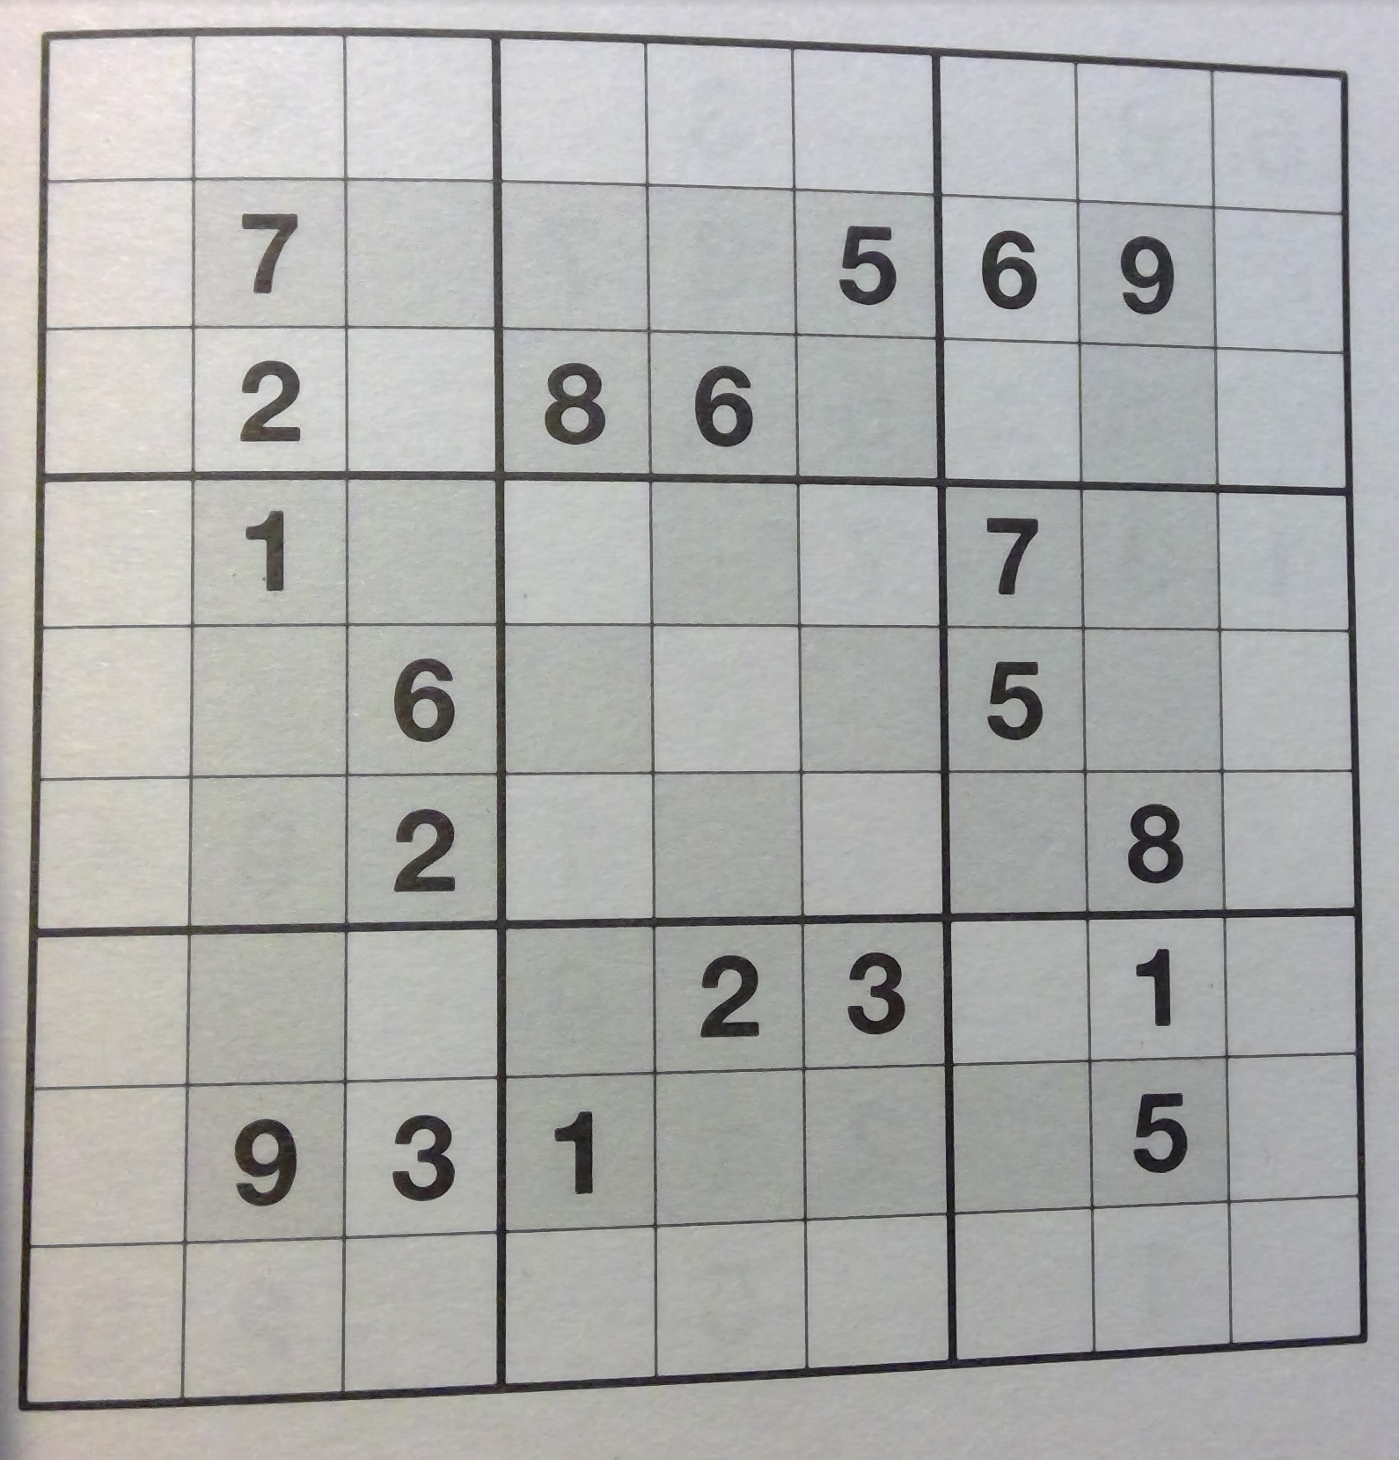 Found This Challenging - Windmill Sudoku : Sudoku